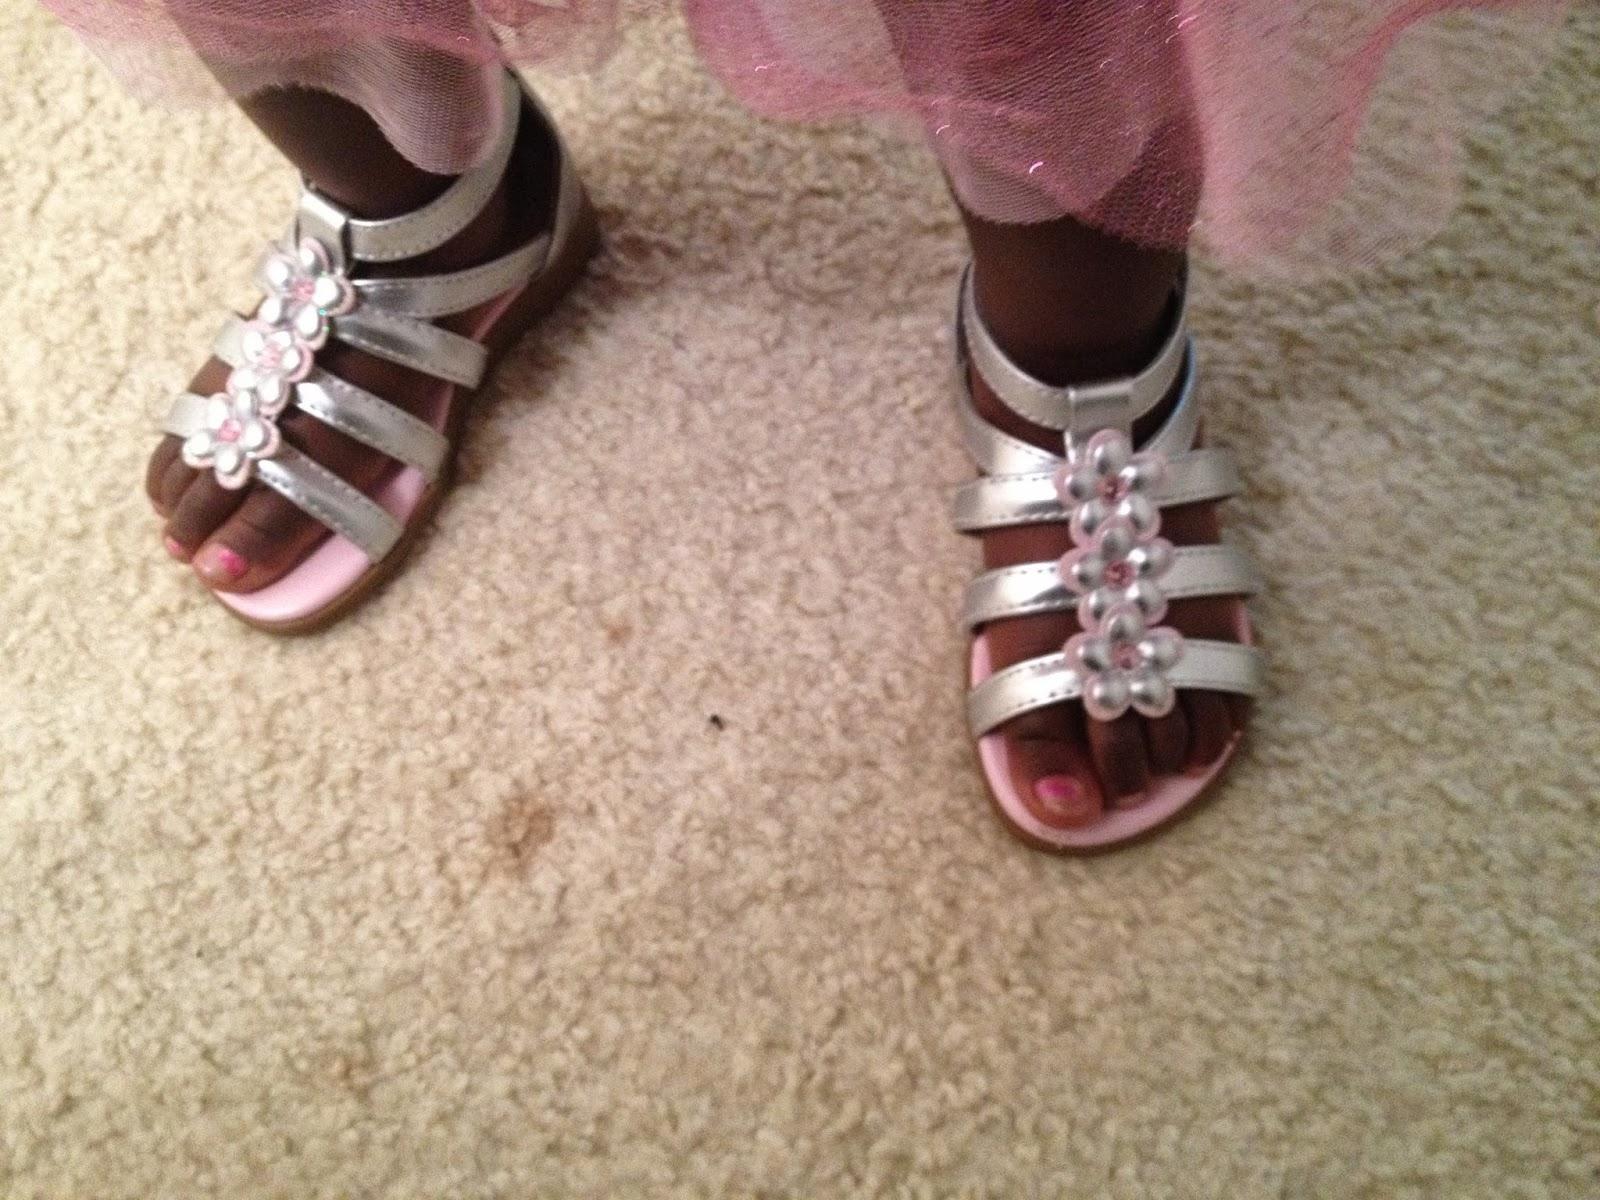 Big Girl's 2 year old feet.